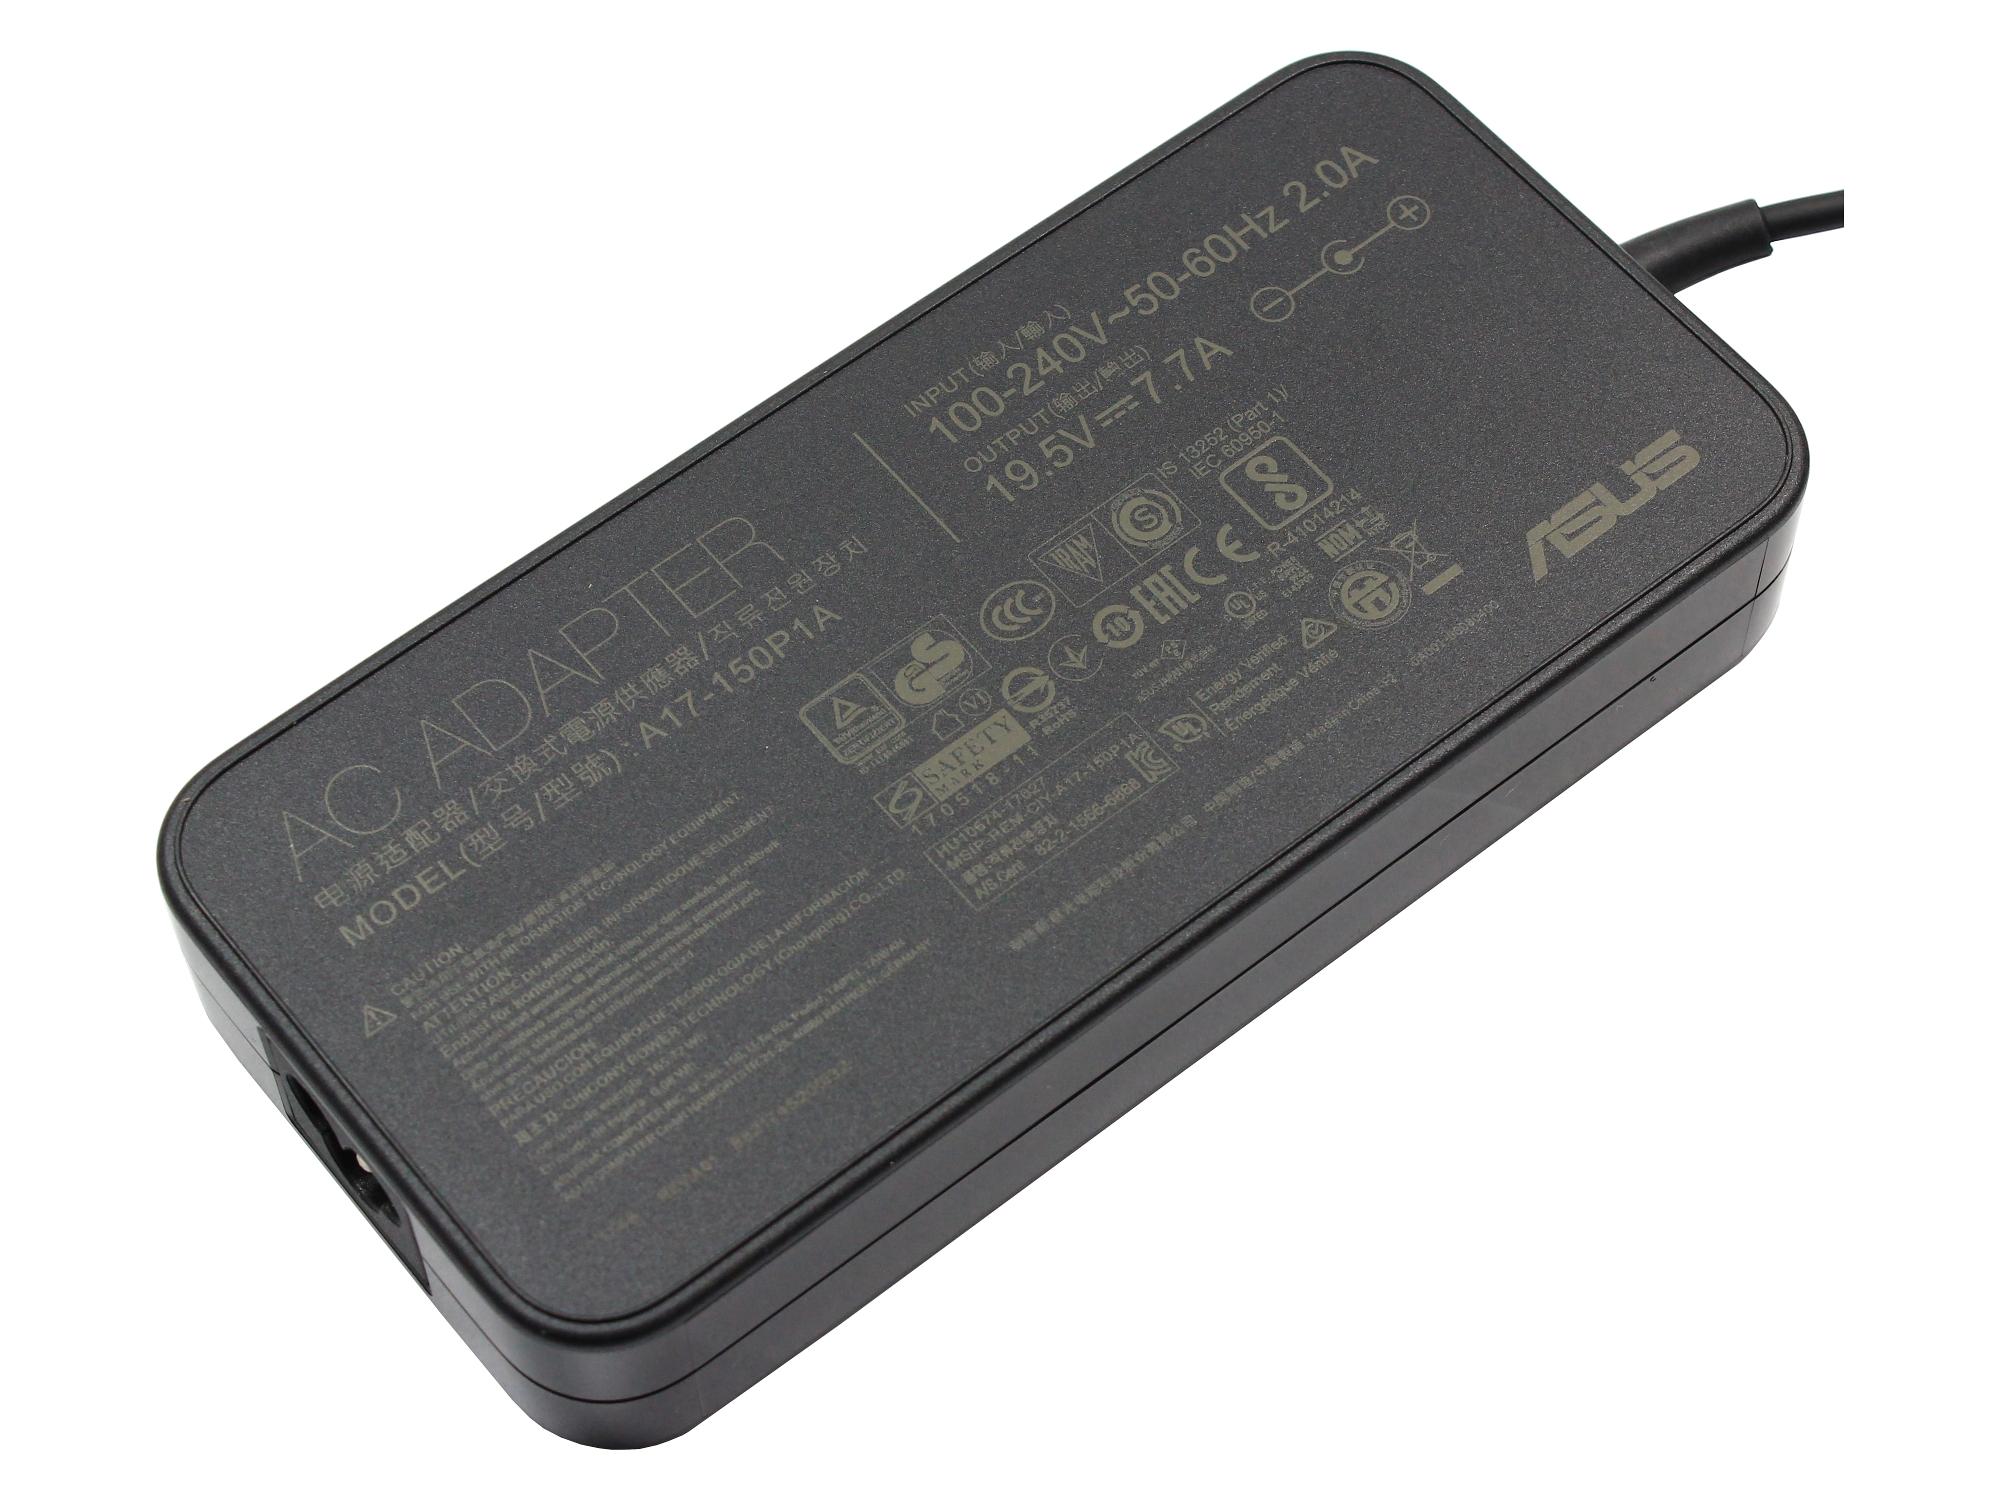 Incarcator original ASUS ROG TUF FX504GM, 150W conector 5.5mm